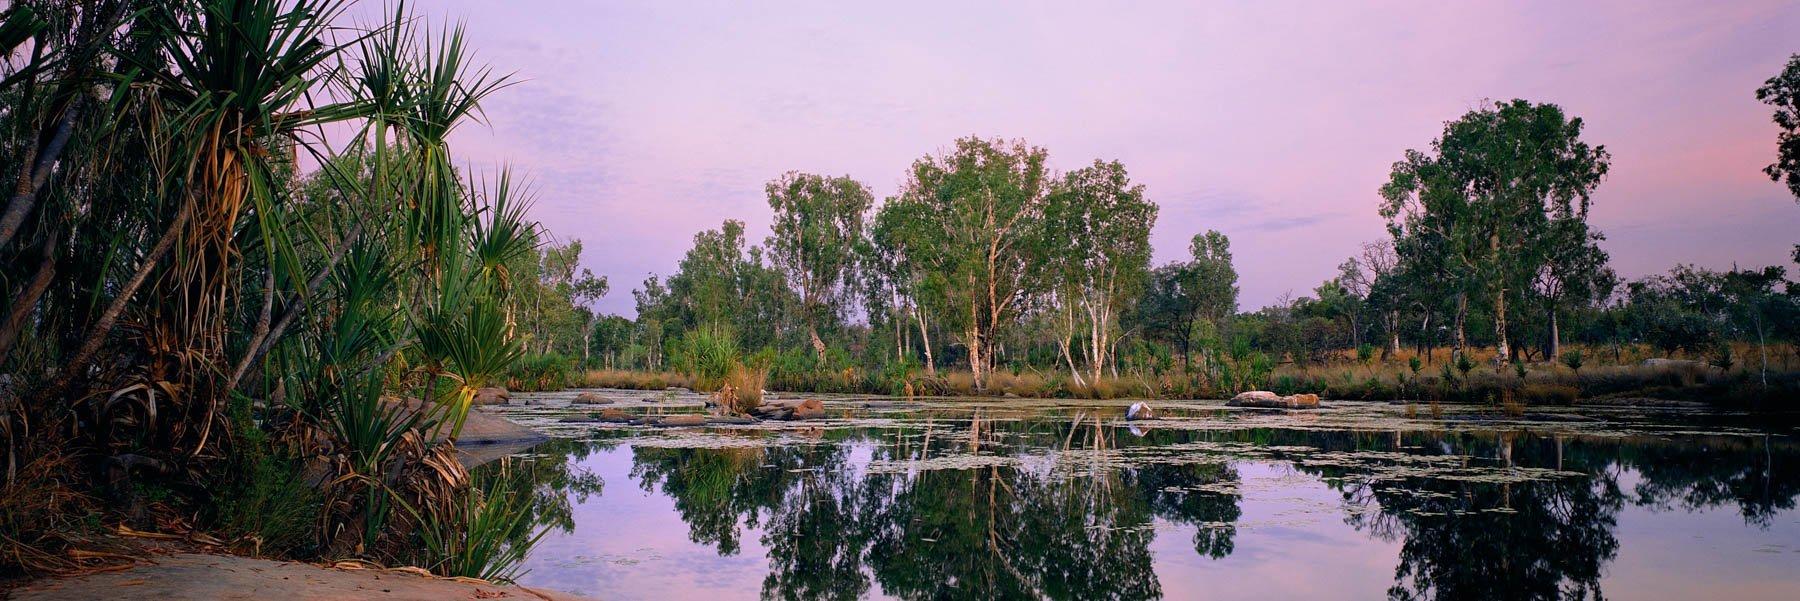 Pandanus palms and trees surrounding Manning Gorge, Kimberley, WA, Australia.